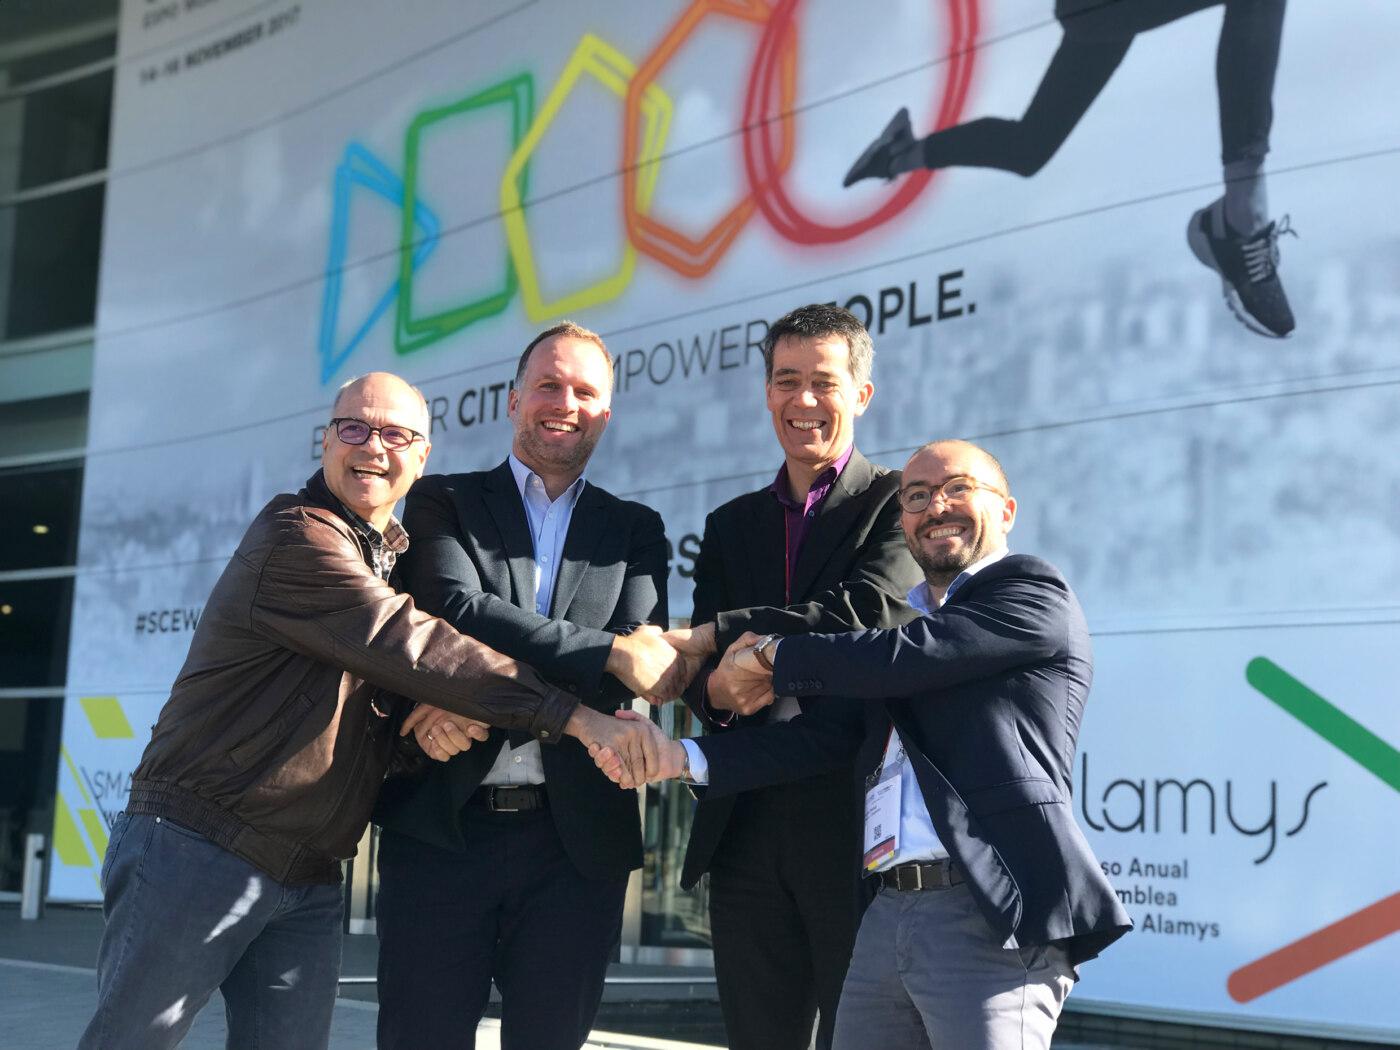 talq-consortium-first-certified-products-2017-300dpi